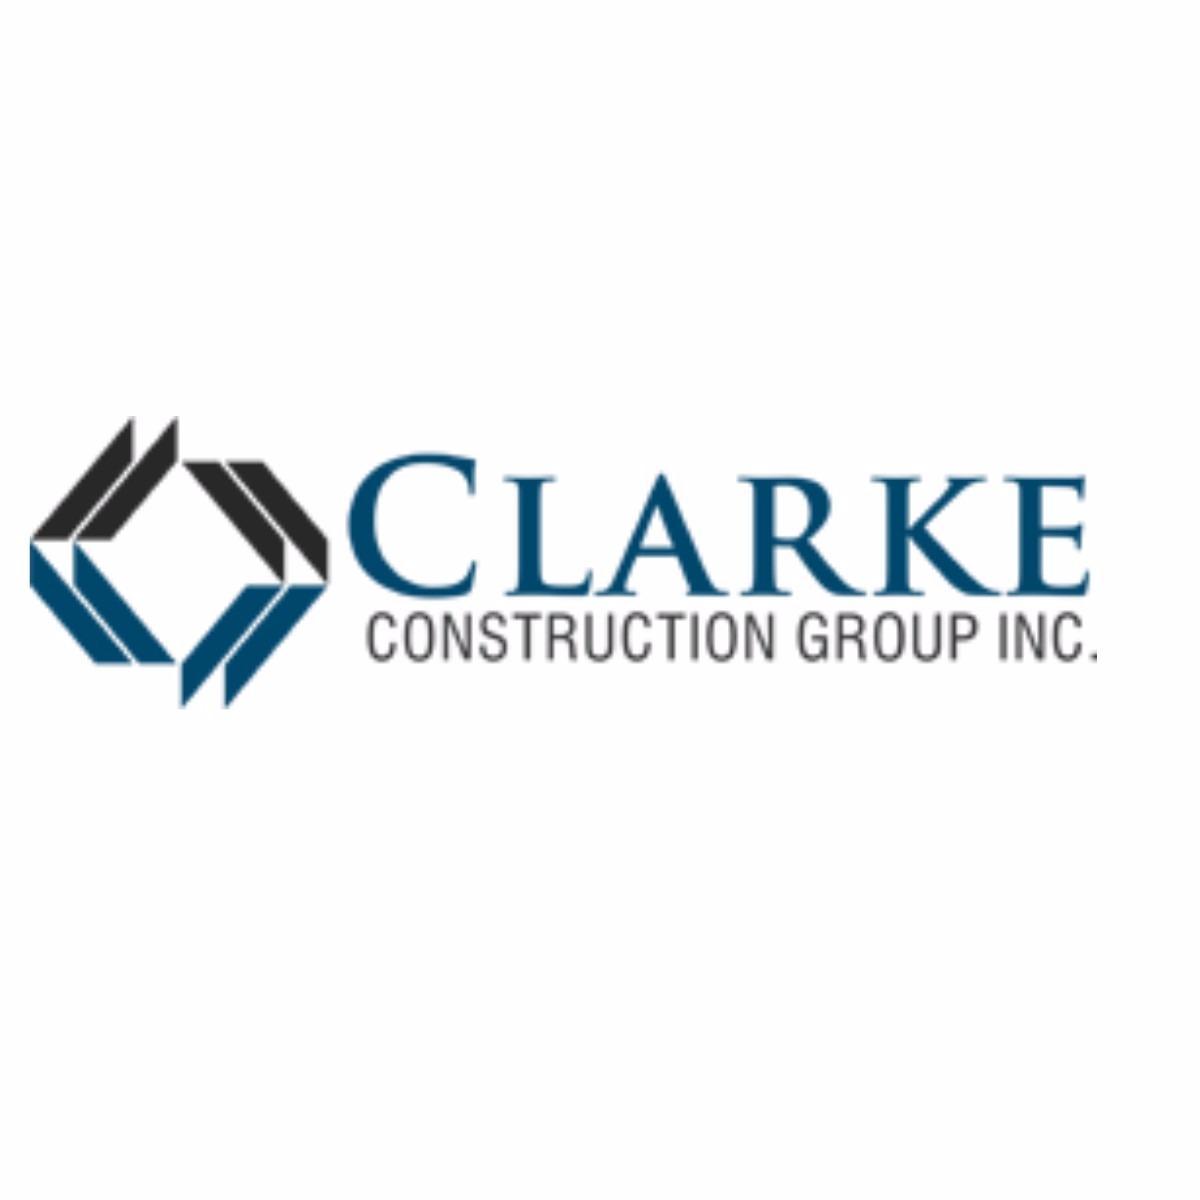 Clarke Construction Group Inc